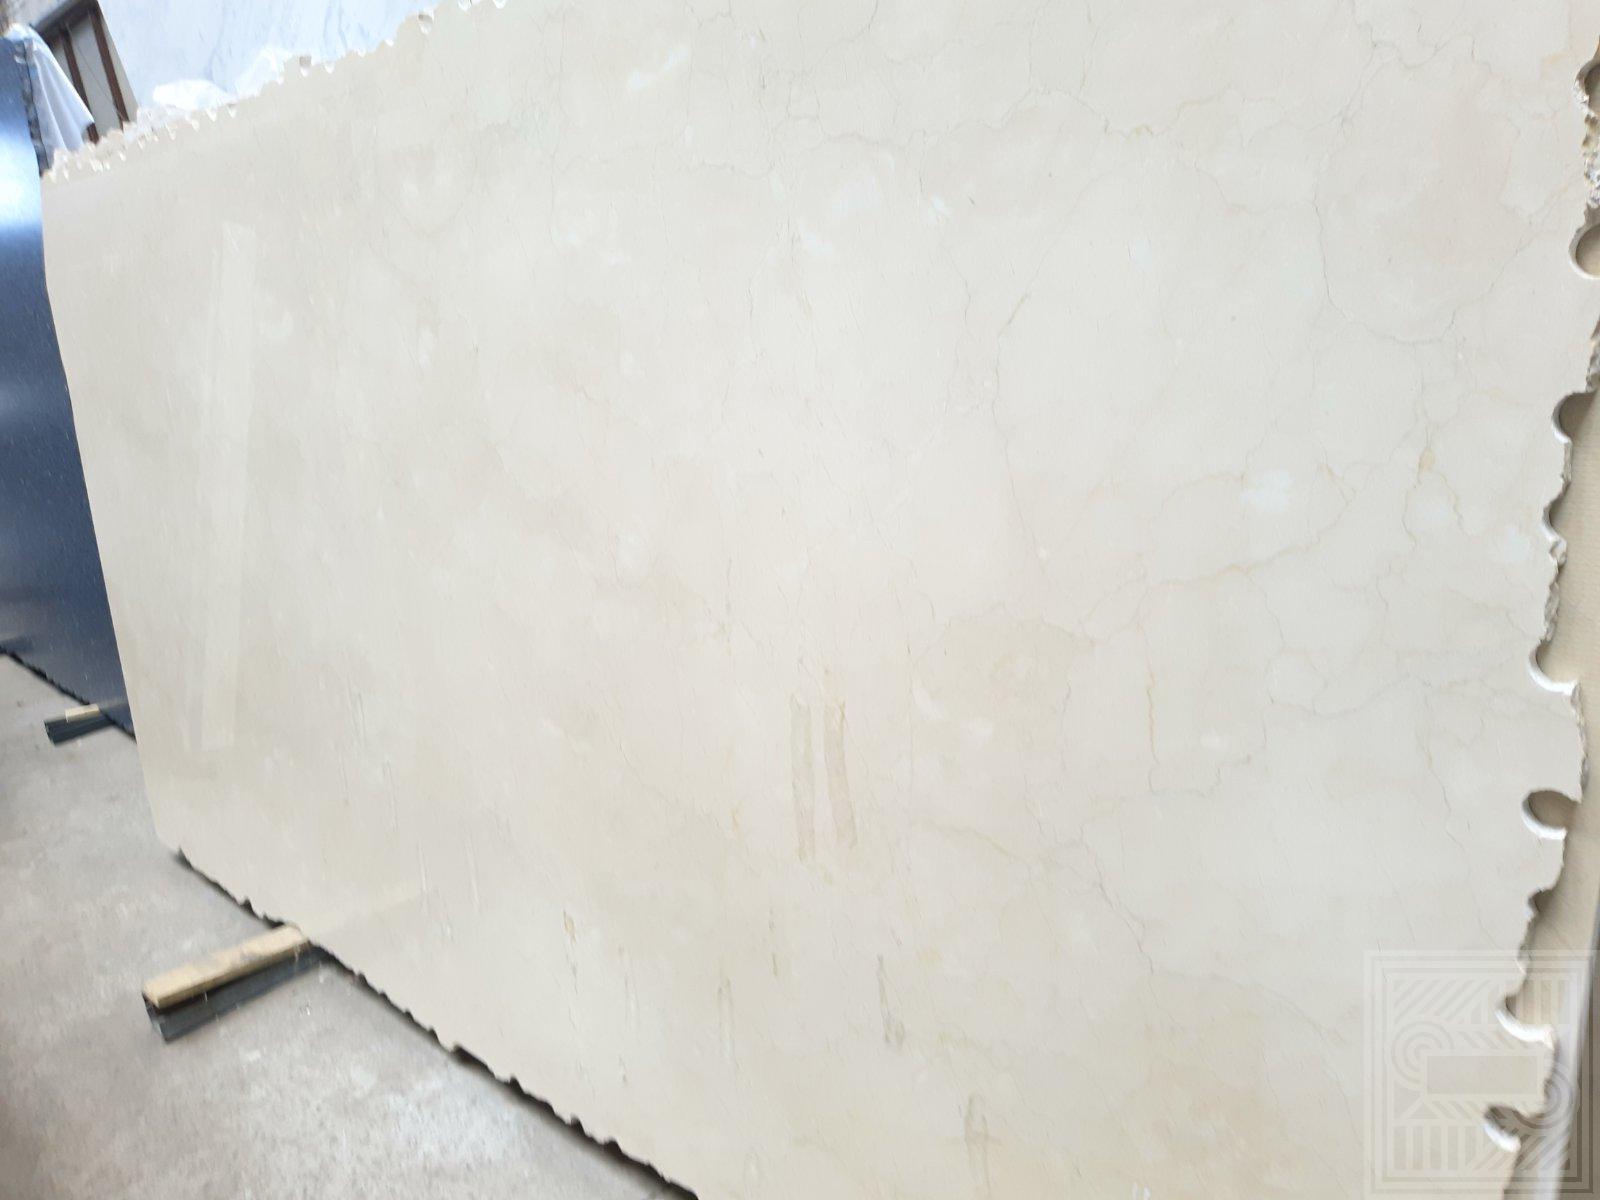 Crema Marfil (20 mm) beige-marble - Crema Marfil 20 mm